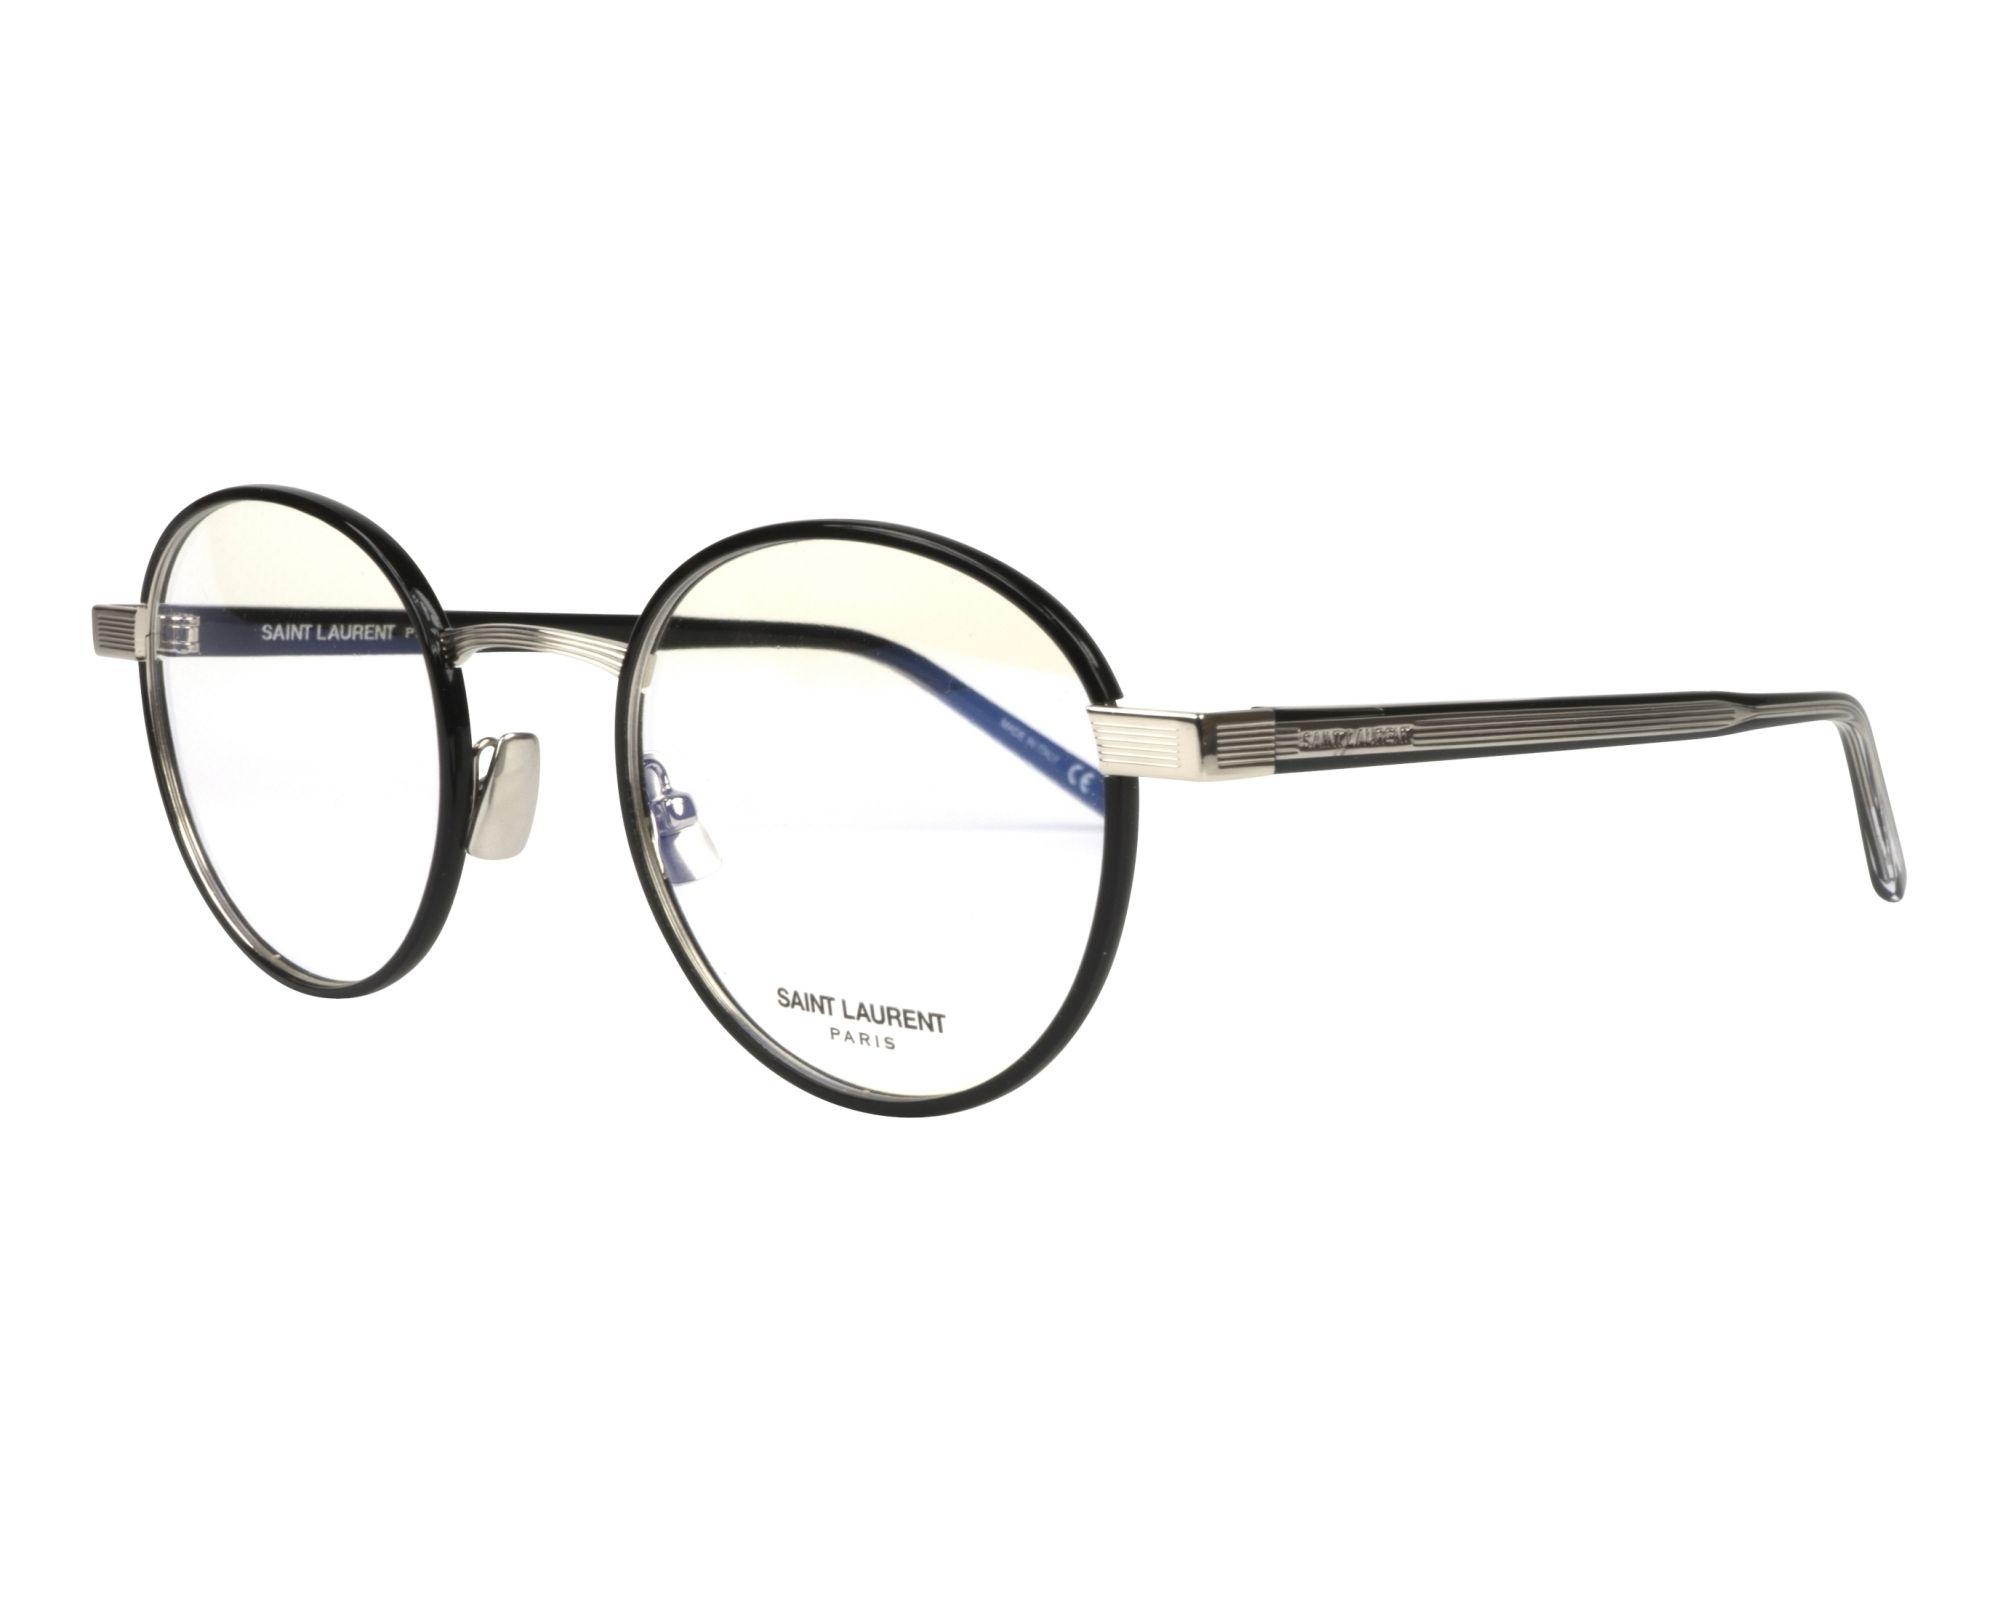 4dba30ad1ea eyeglasses Yves Saint Laurent SL-125 001 49-22 Black Silver profile view